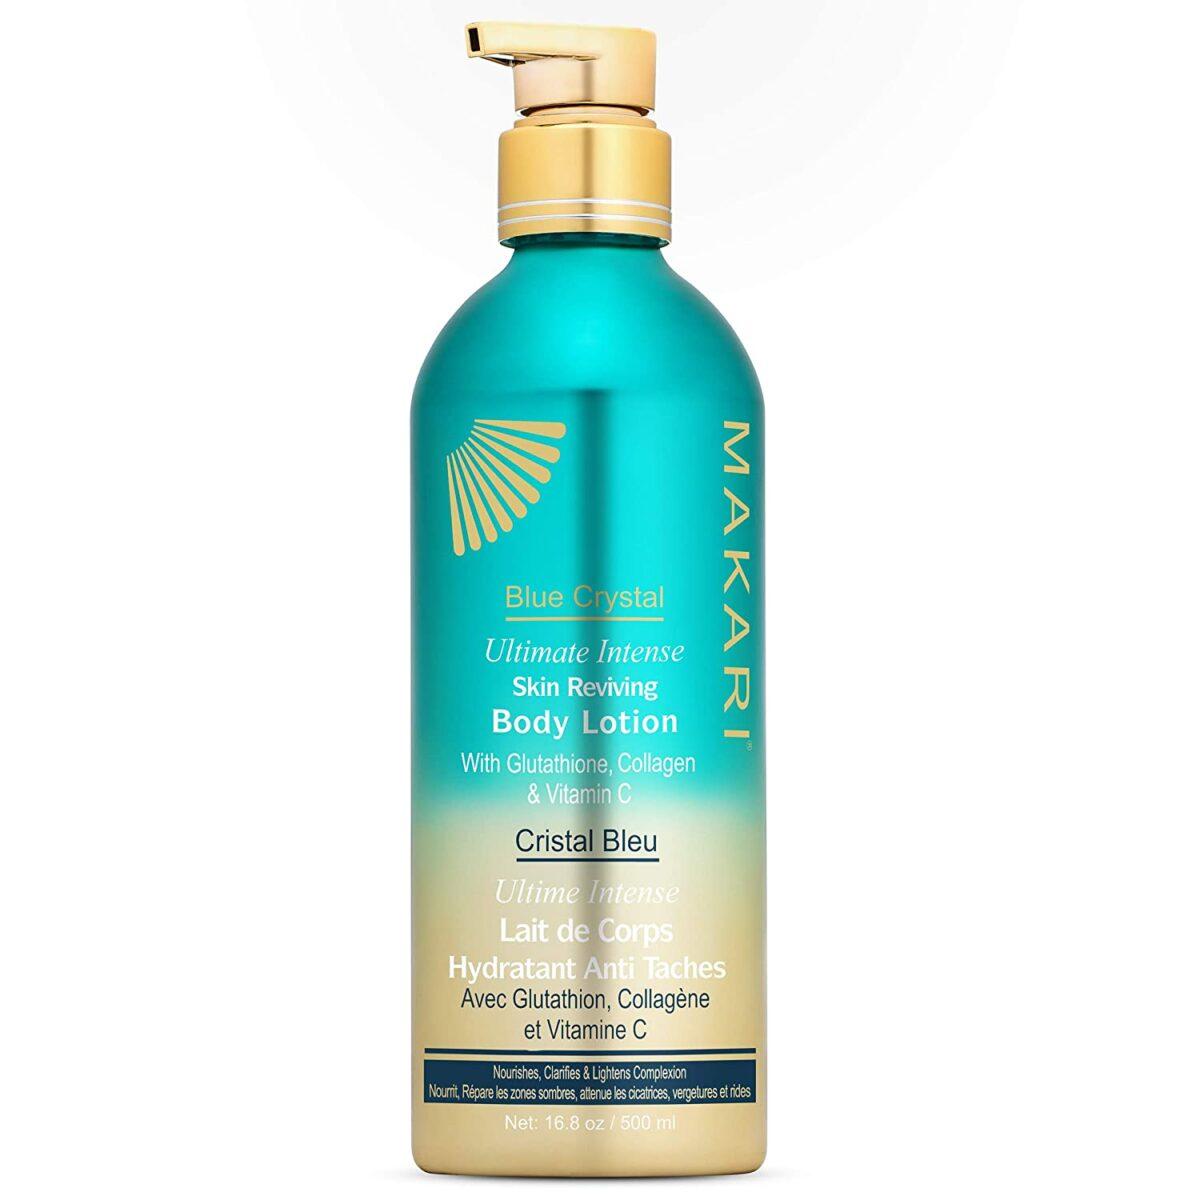 Makari Blue Crystal Reviving Body Lotion 16.8 oz - Lightening, Brightening, Moisturizing Cream with Natural Glutathione